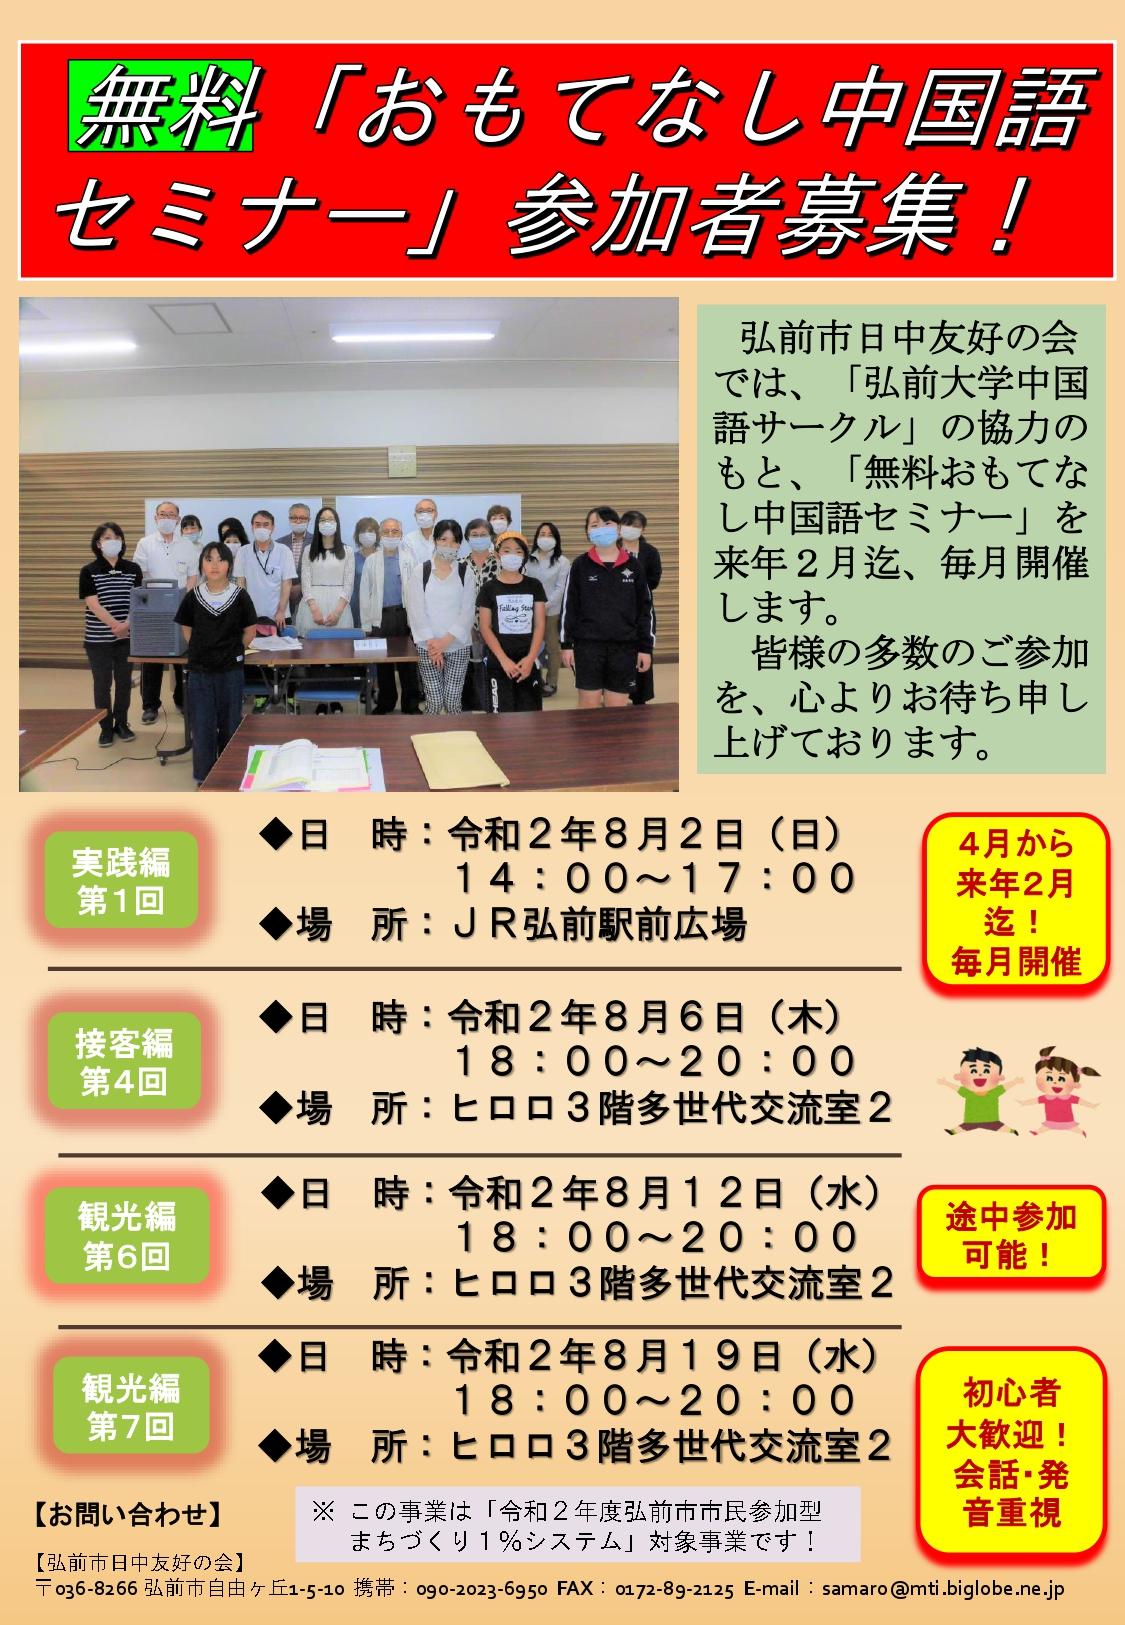 【R2八月】無料中国語おもてなしセミナー_page-0001.jpg